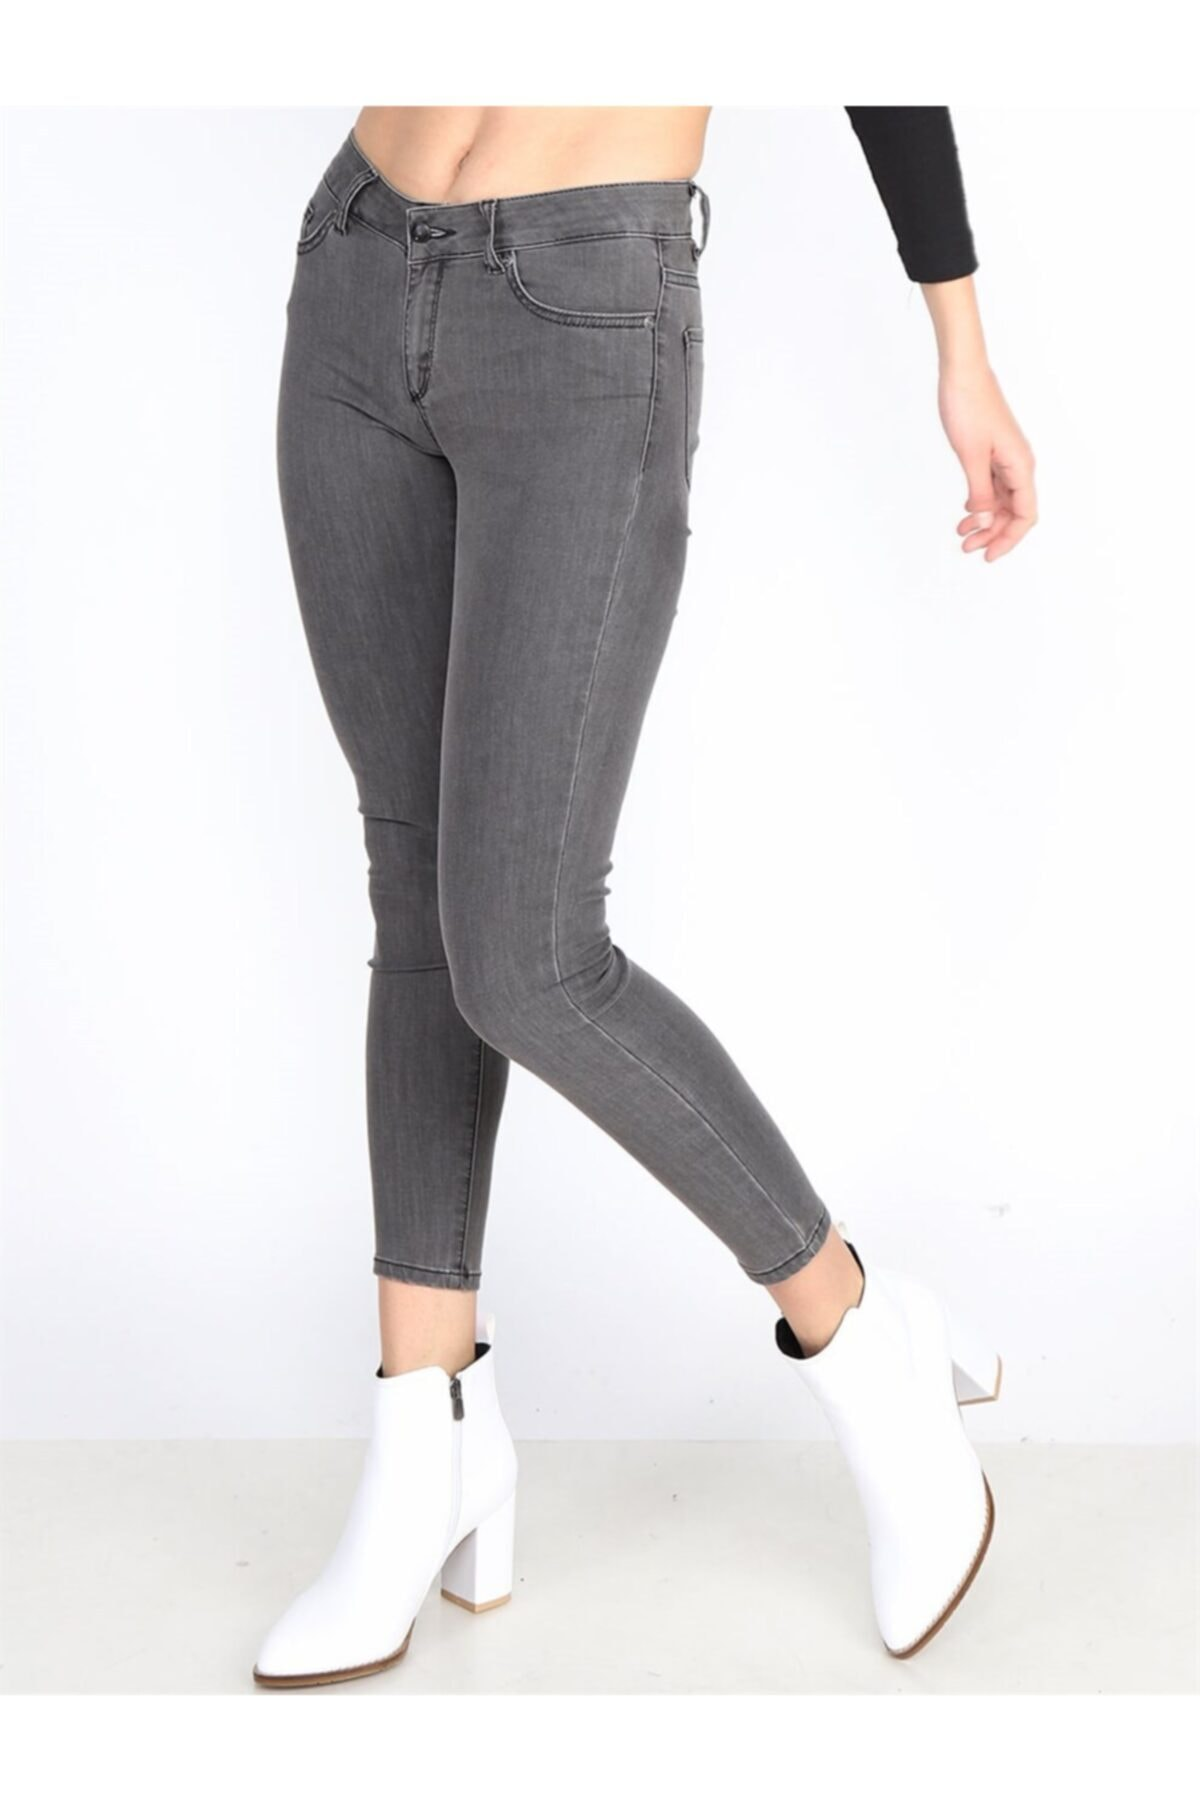 Twister Jeans Kadın Slim Fit Orta Bel Pantolon Lıma 9046-17 C 17 2